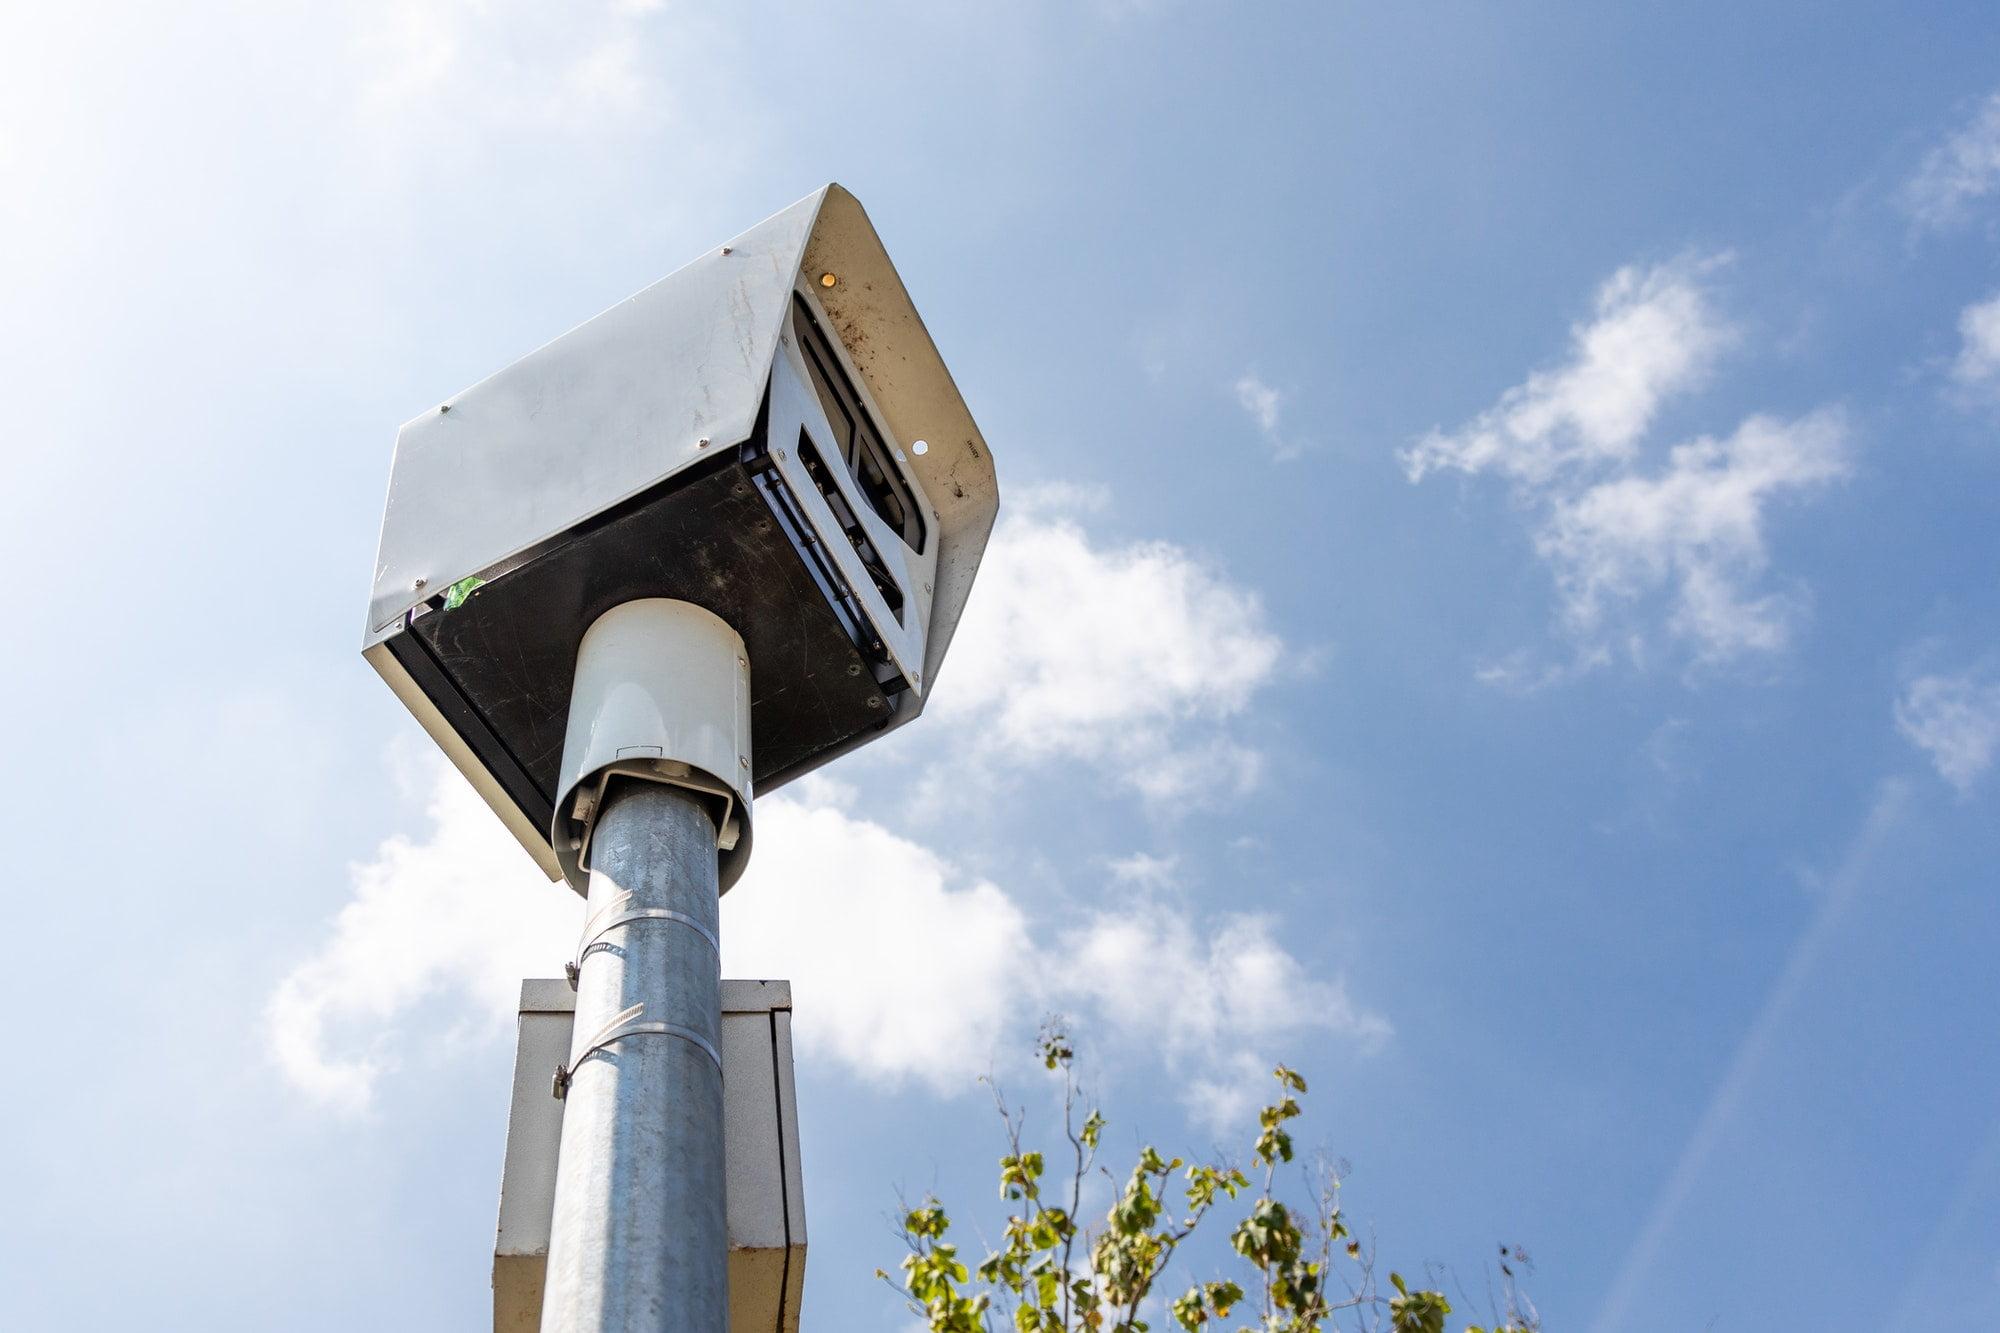 Close-up on speed trap surveillance camera along highway.